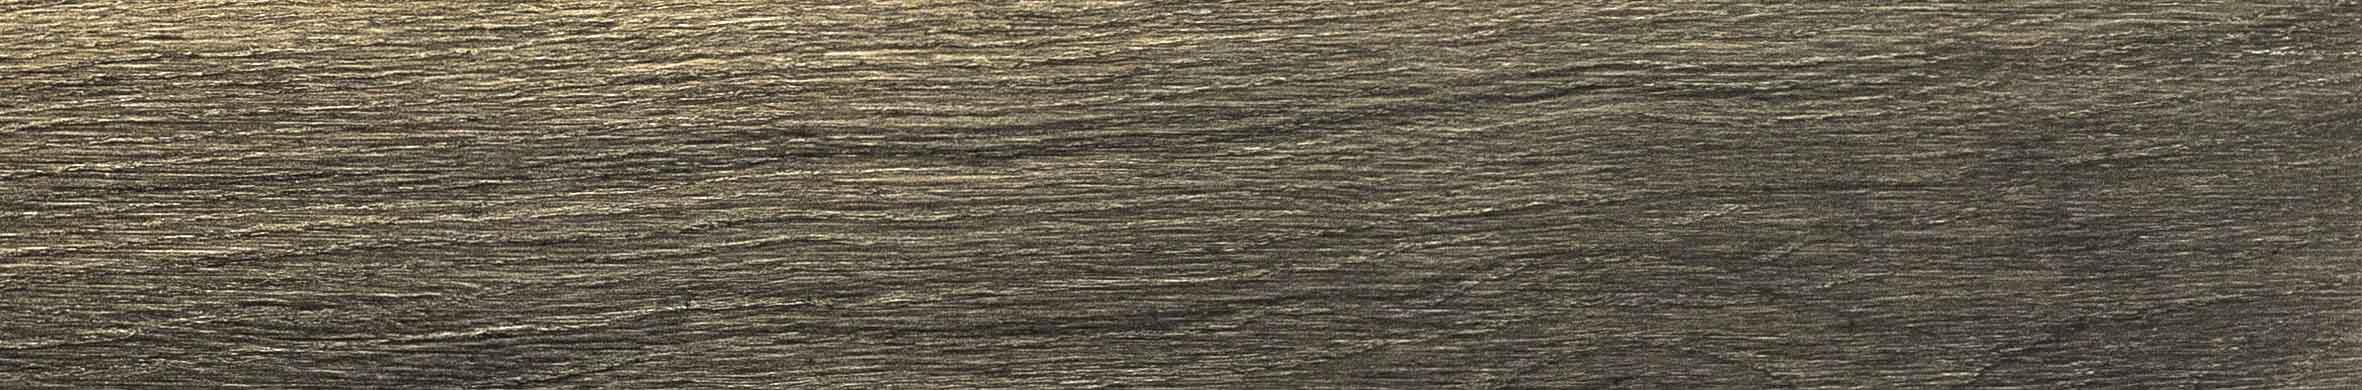 Planches de Rex Choco Matte 10mm 20 x 120